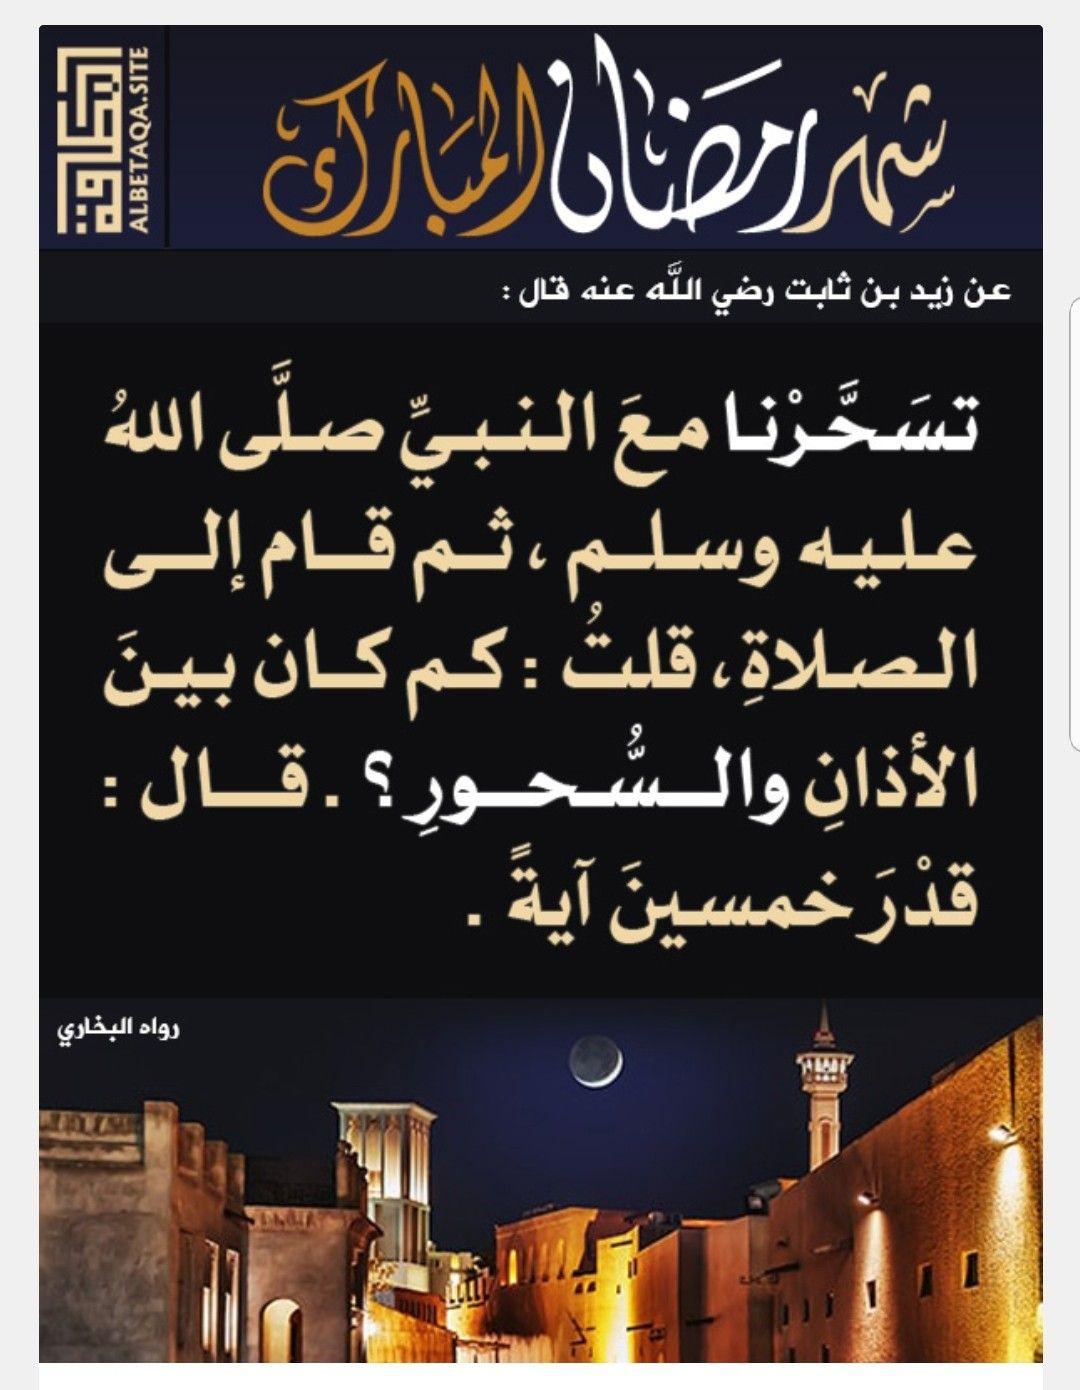 ختم السنة مختصر صحيح مسلم ـ كتاب الصيام ـ باب فضل شهر رمضان Calm Artwork Keep Calm Artwork Calm